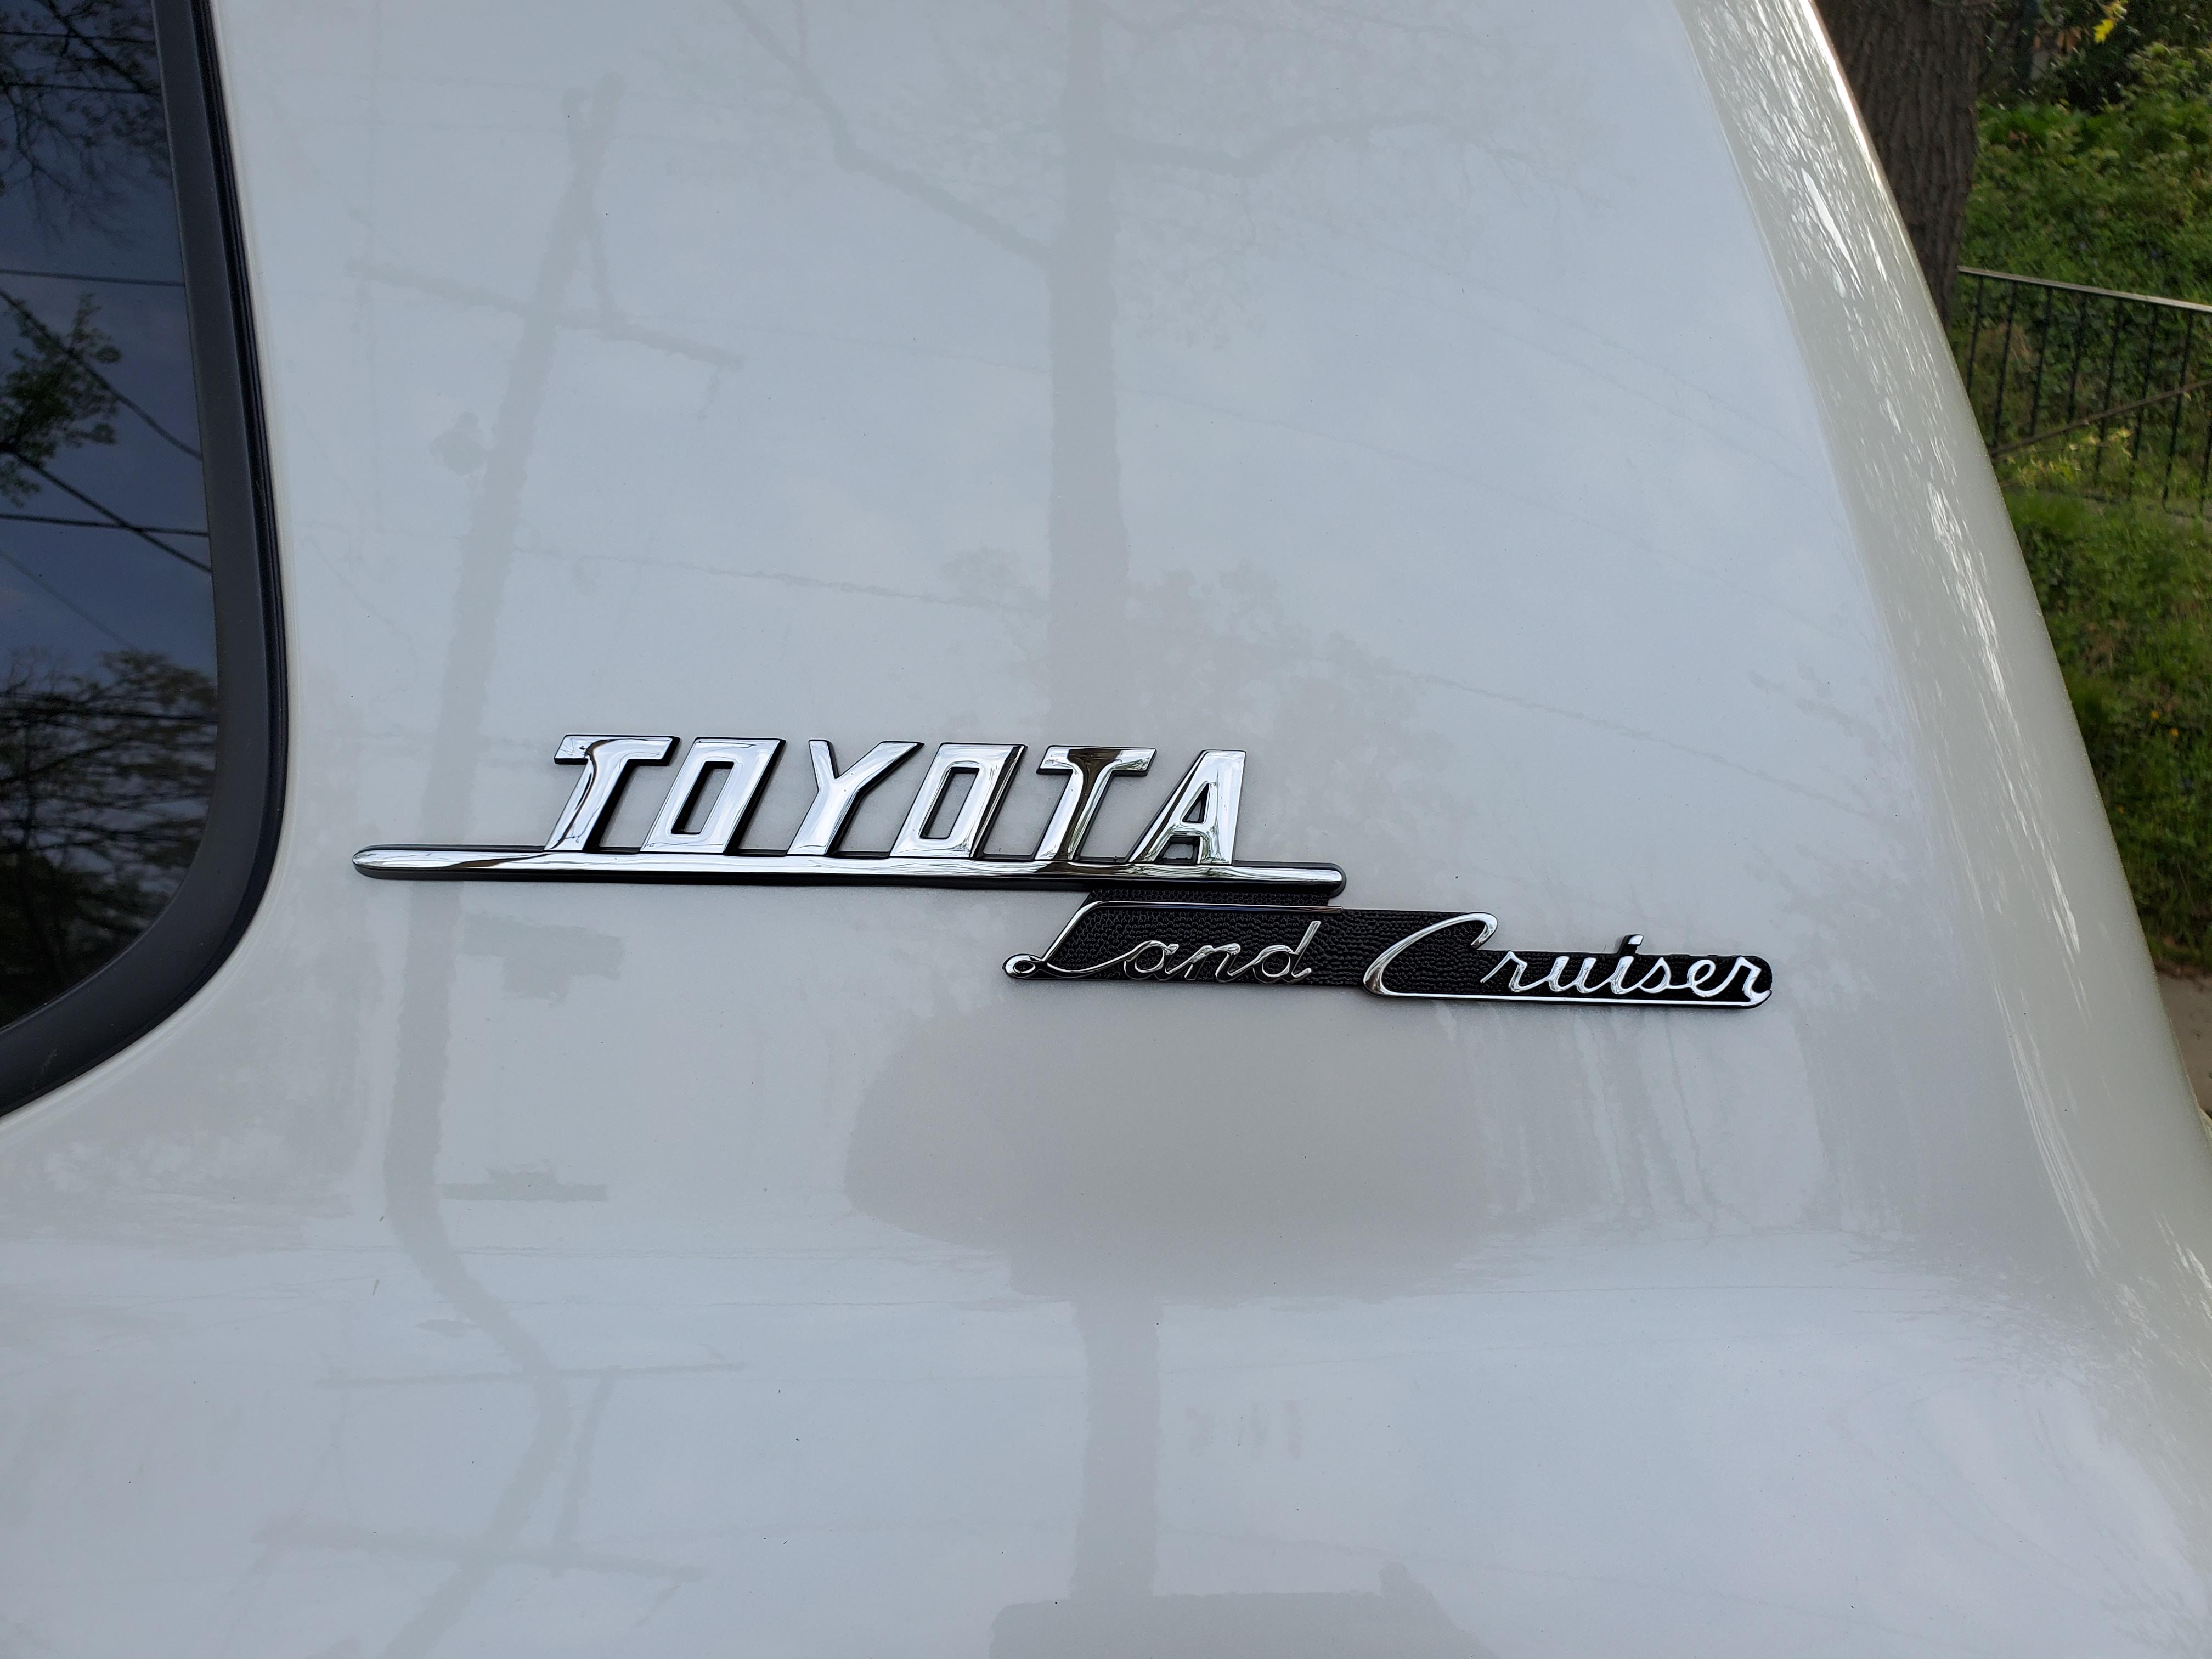 Historic Toyota Land Cruiser logo